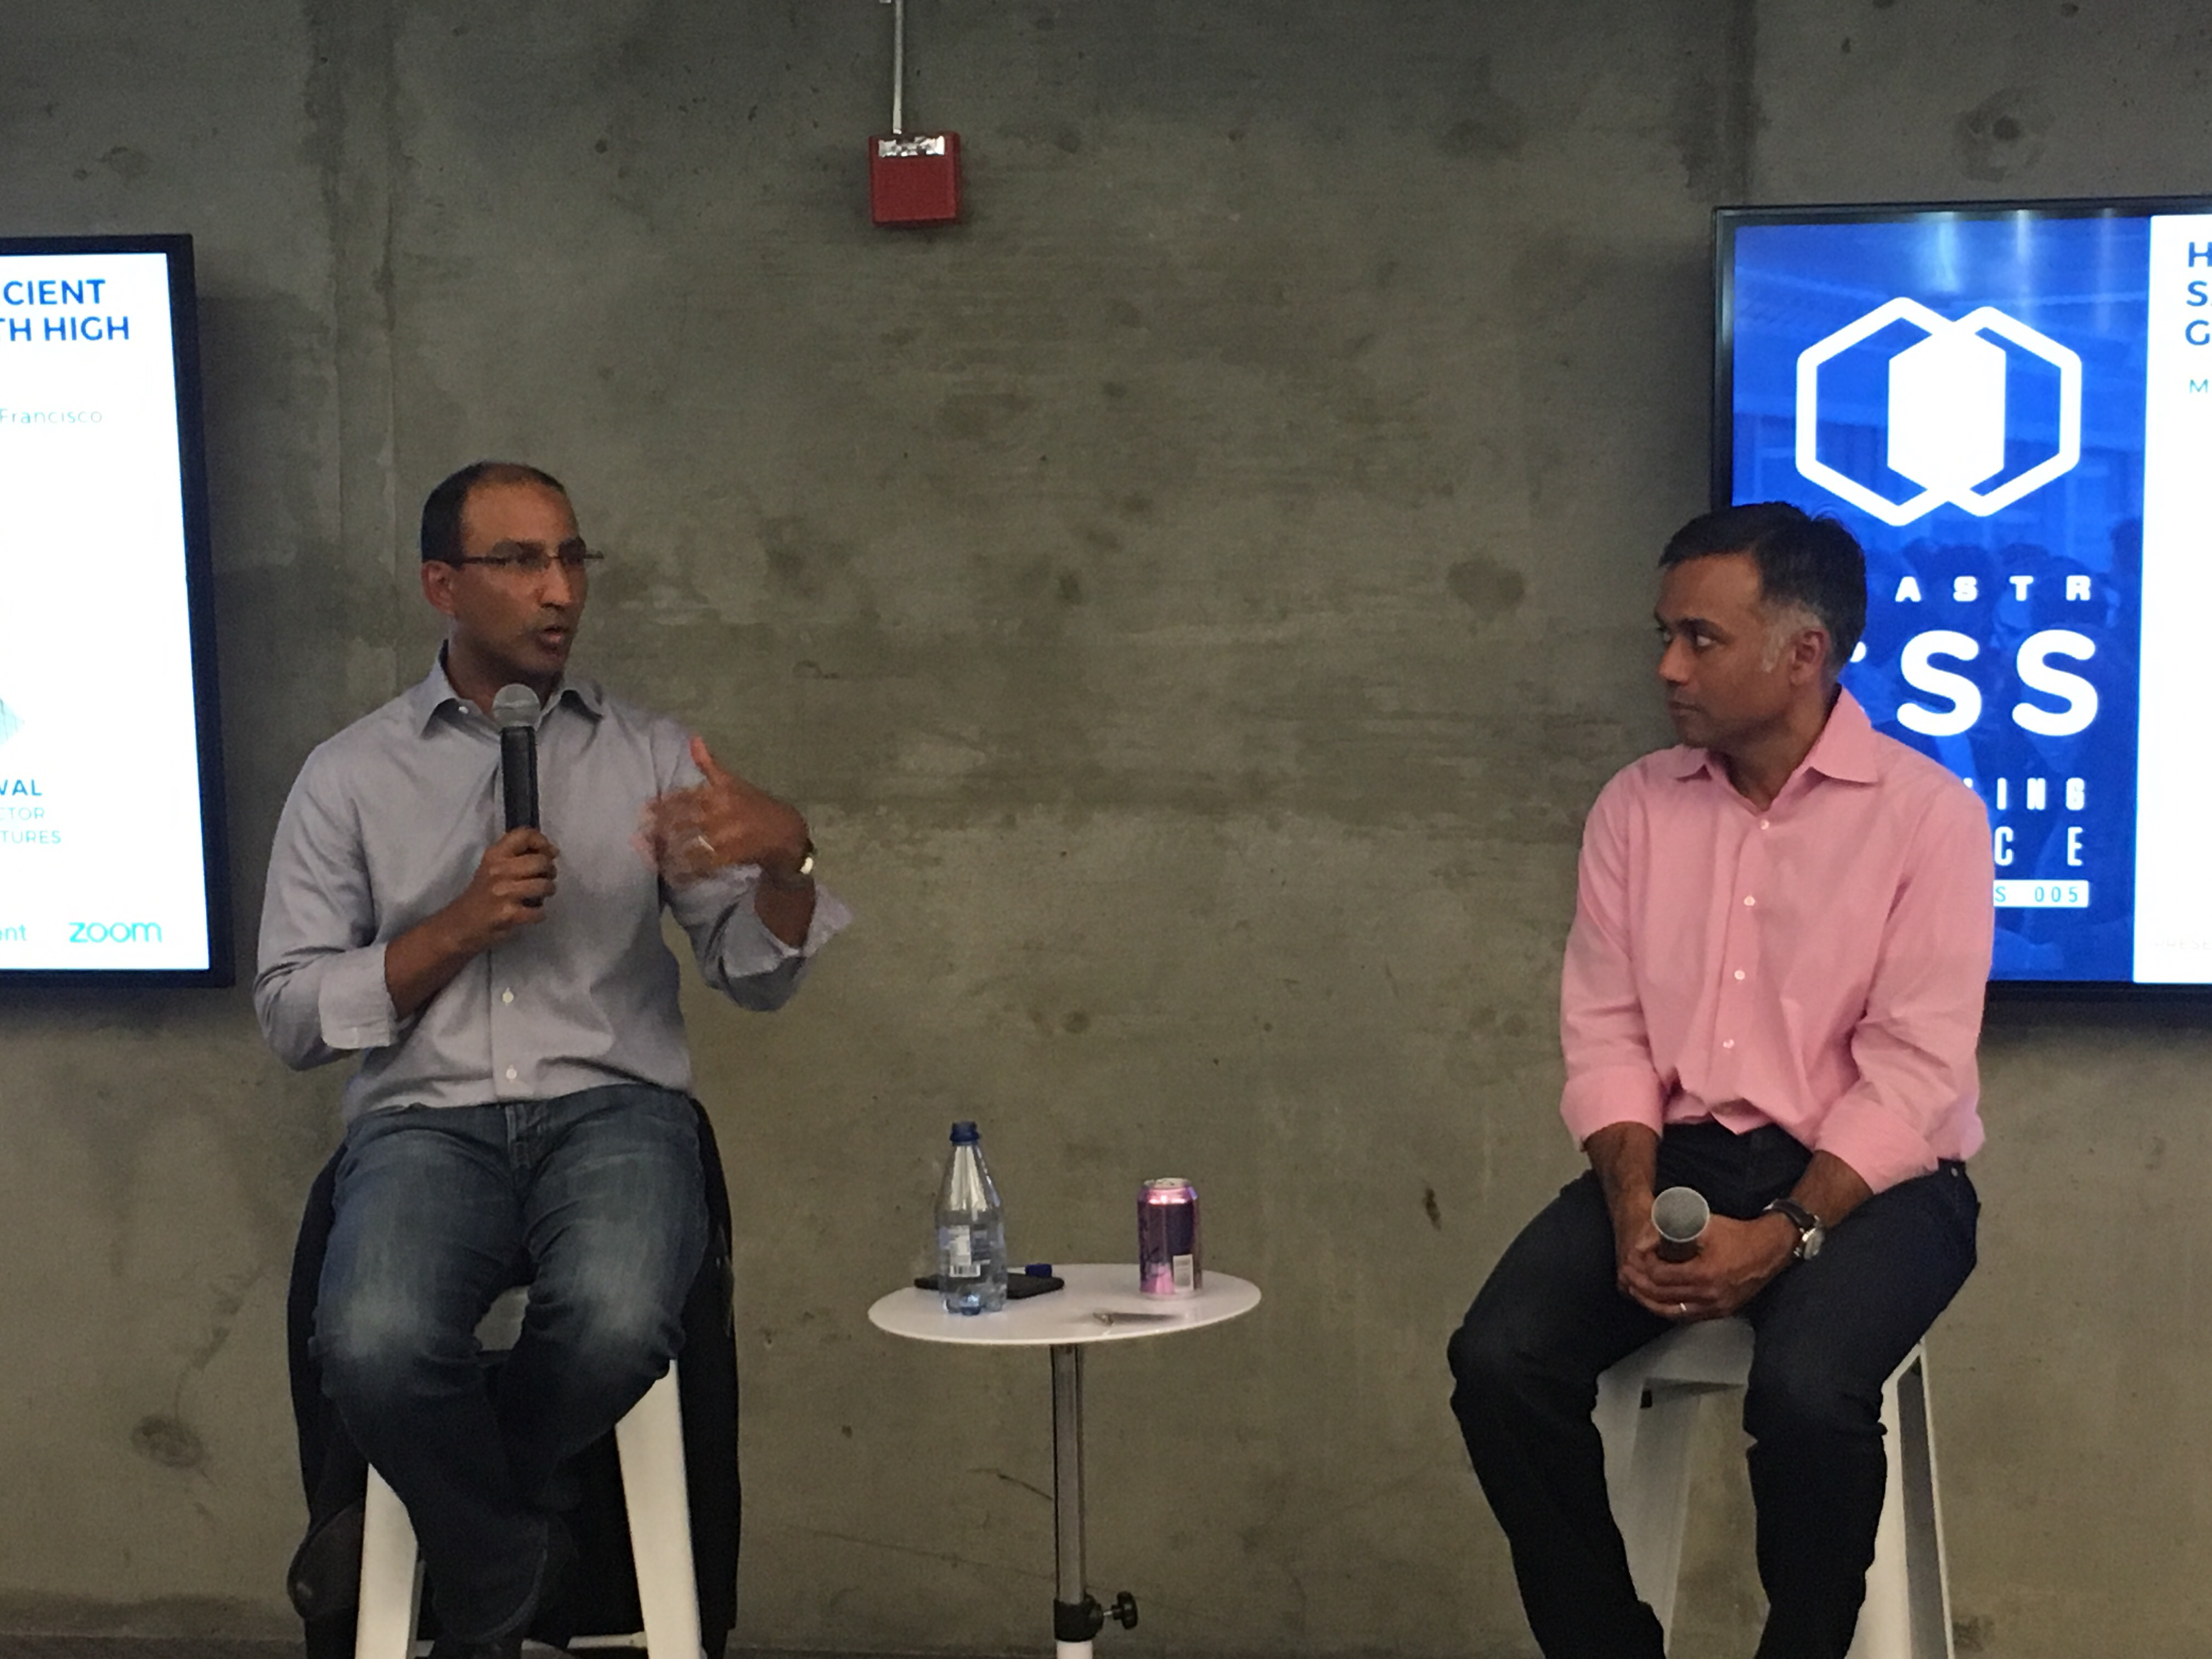 Sameer Dholakia and Ajay Agarwal recollecting early days at Trilogy - Paubox